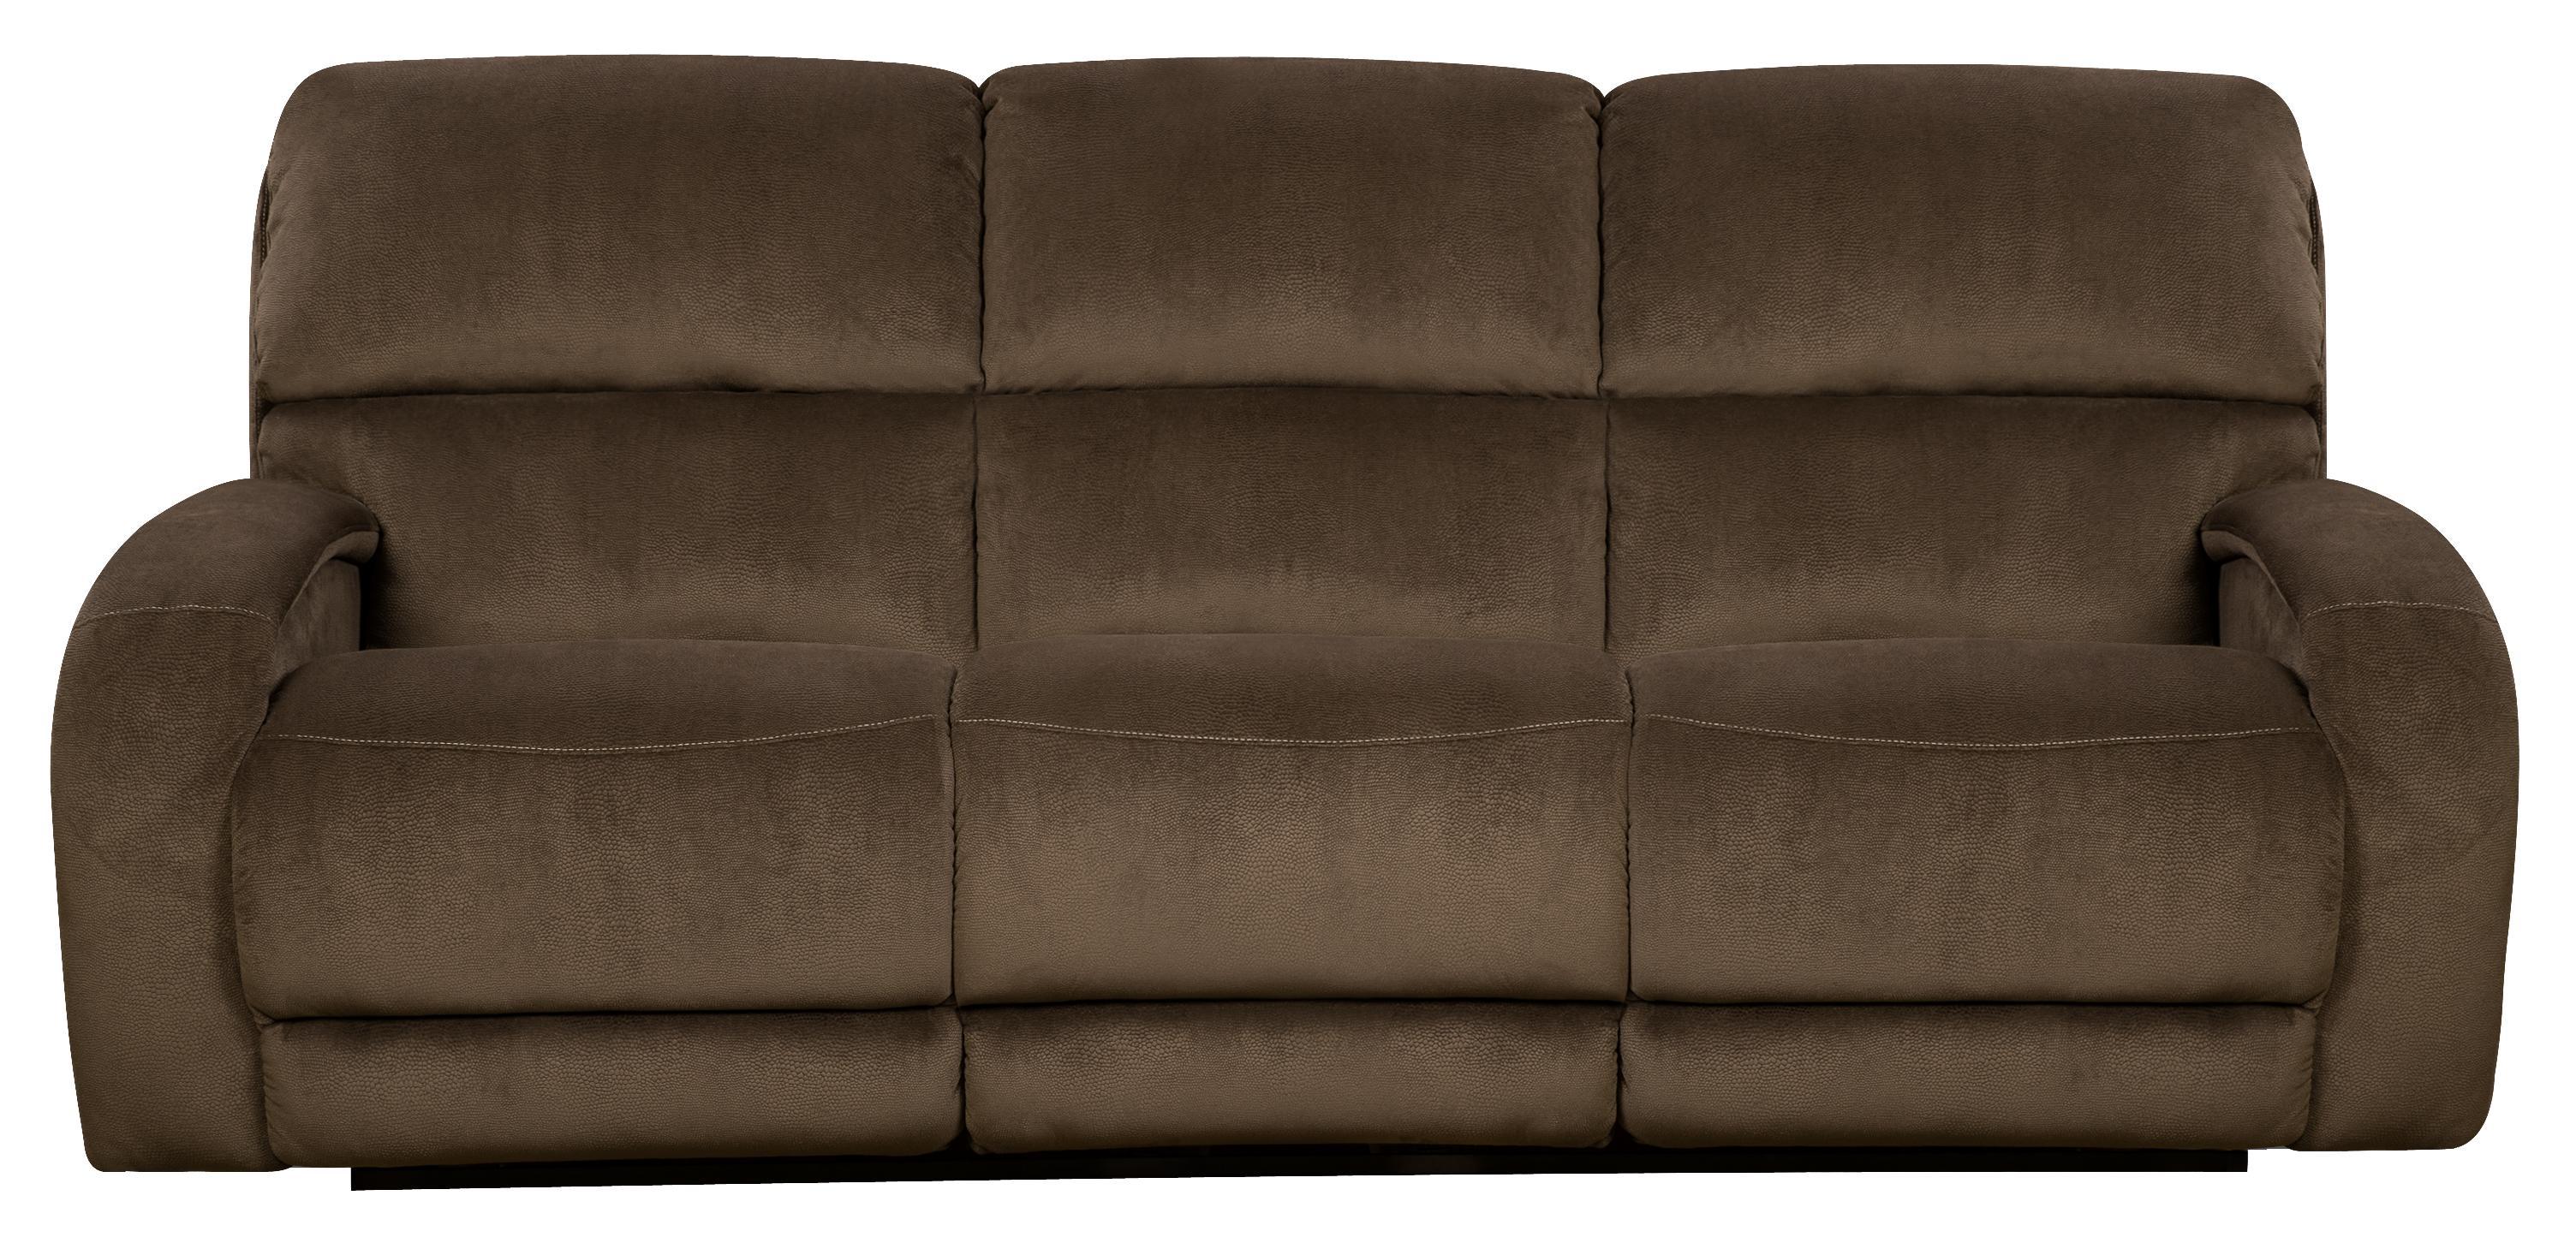 Fandango Power Headrest Reclining Sofa by Southern Motion at Johnny Janosik